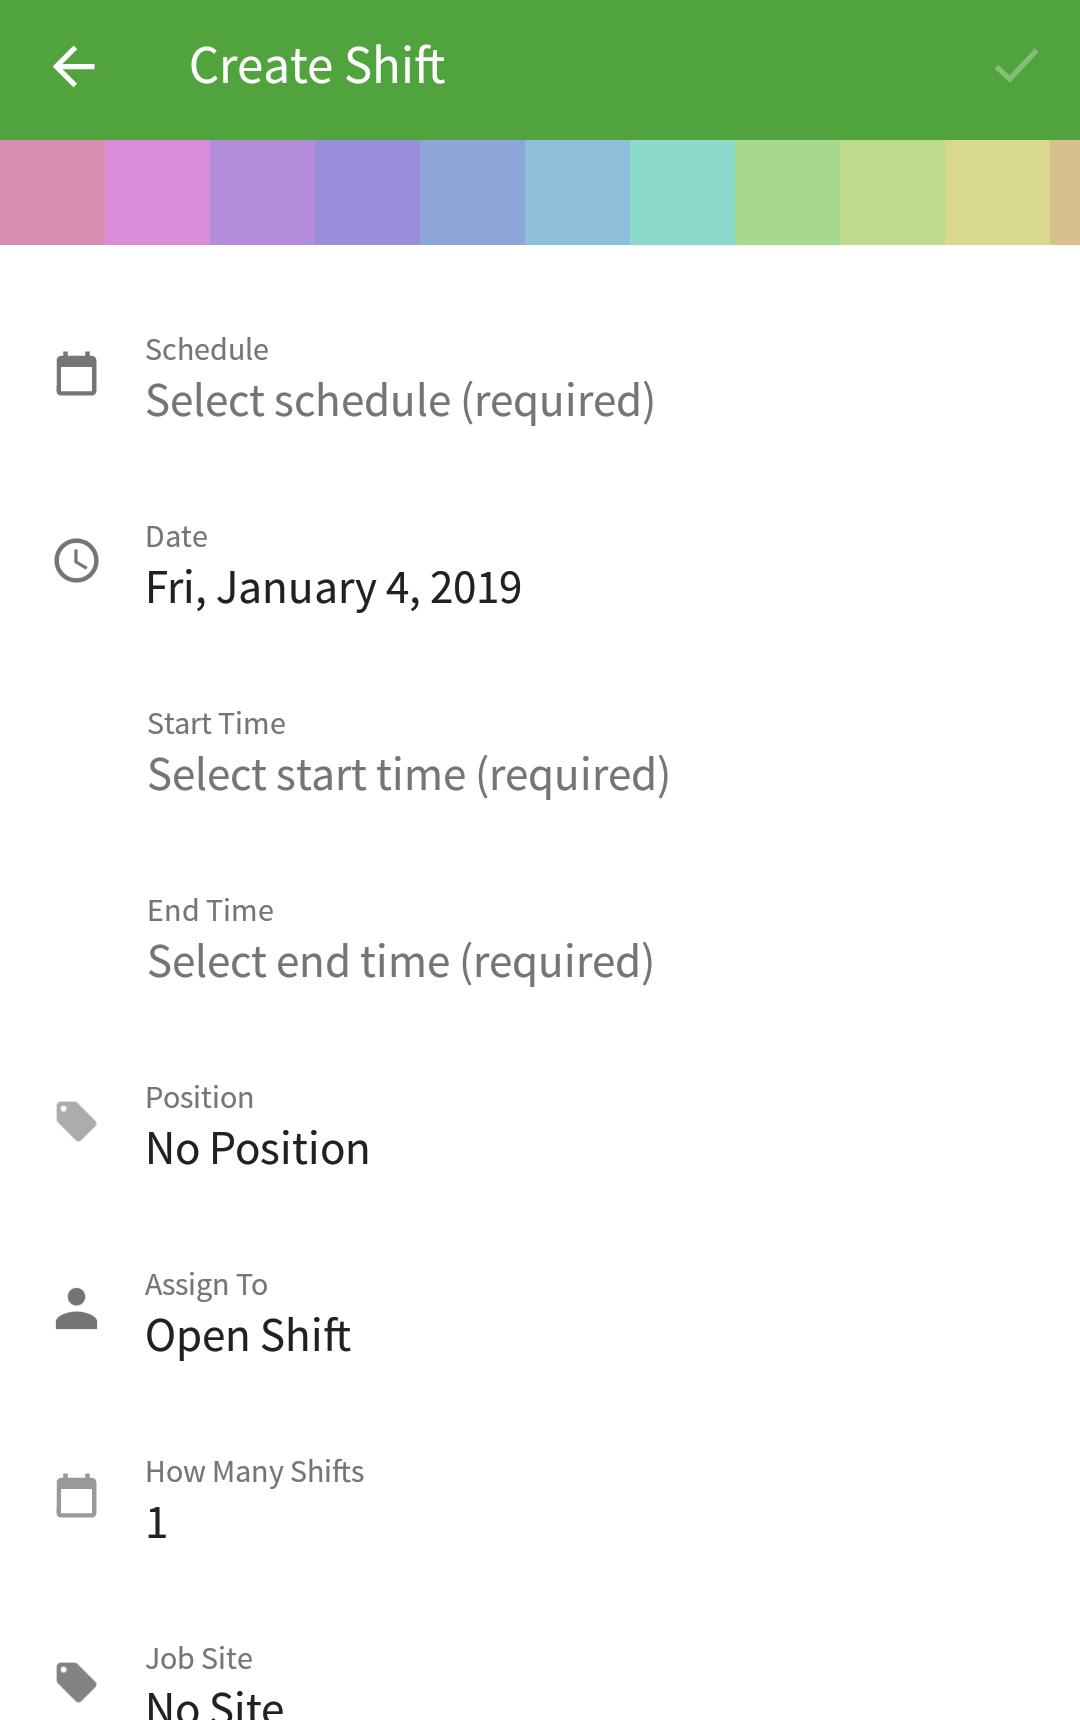 Scheduling A Shift When I Work Help Center